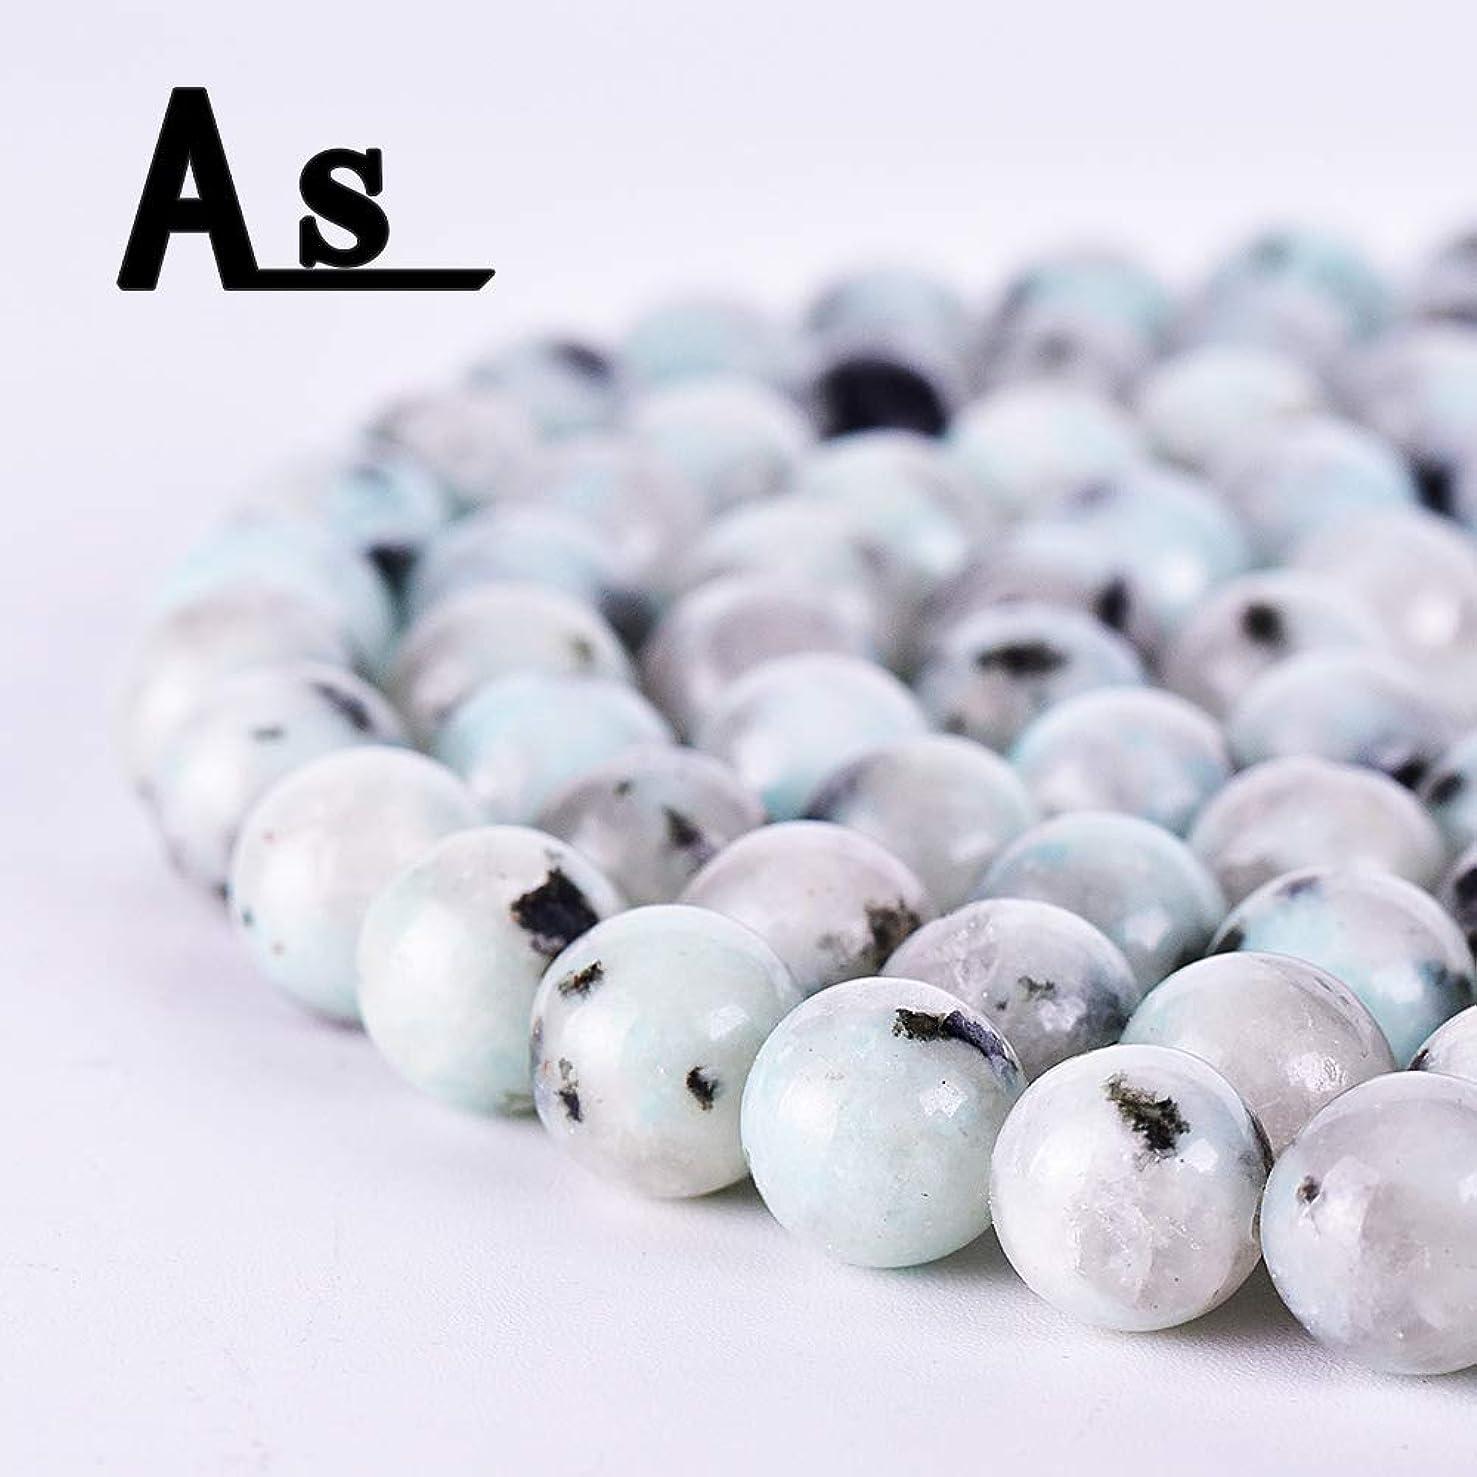 Asingeloo Natural 8mm Maoshan Jade Gemstones Smooth Round Stones Beads for Jewelry Making Crystal Energy Stone Healing Power 15